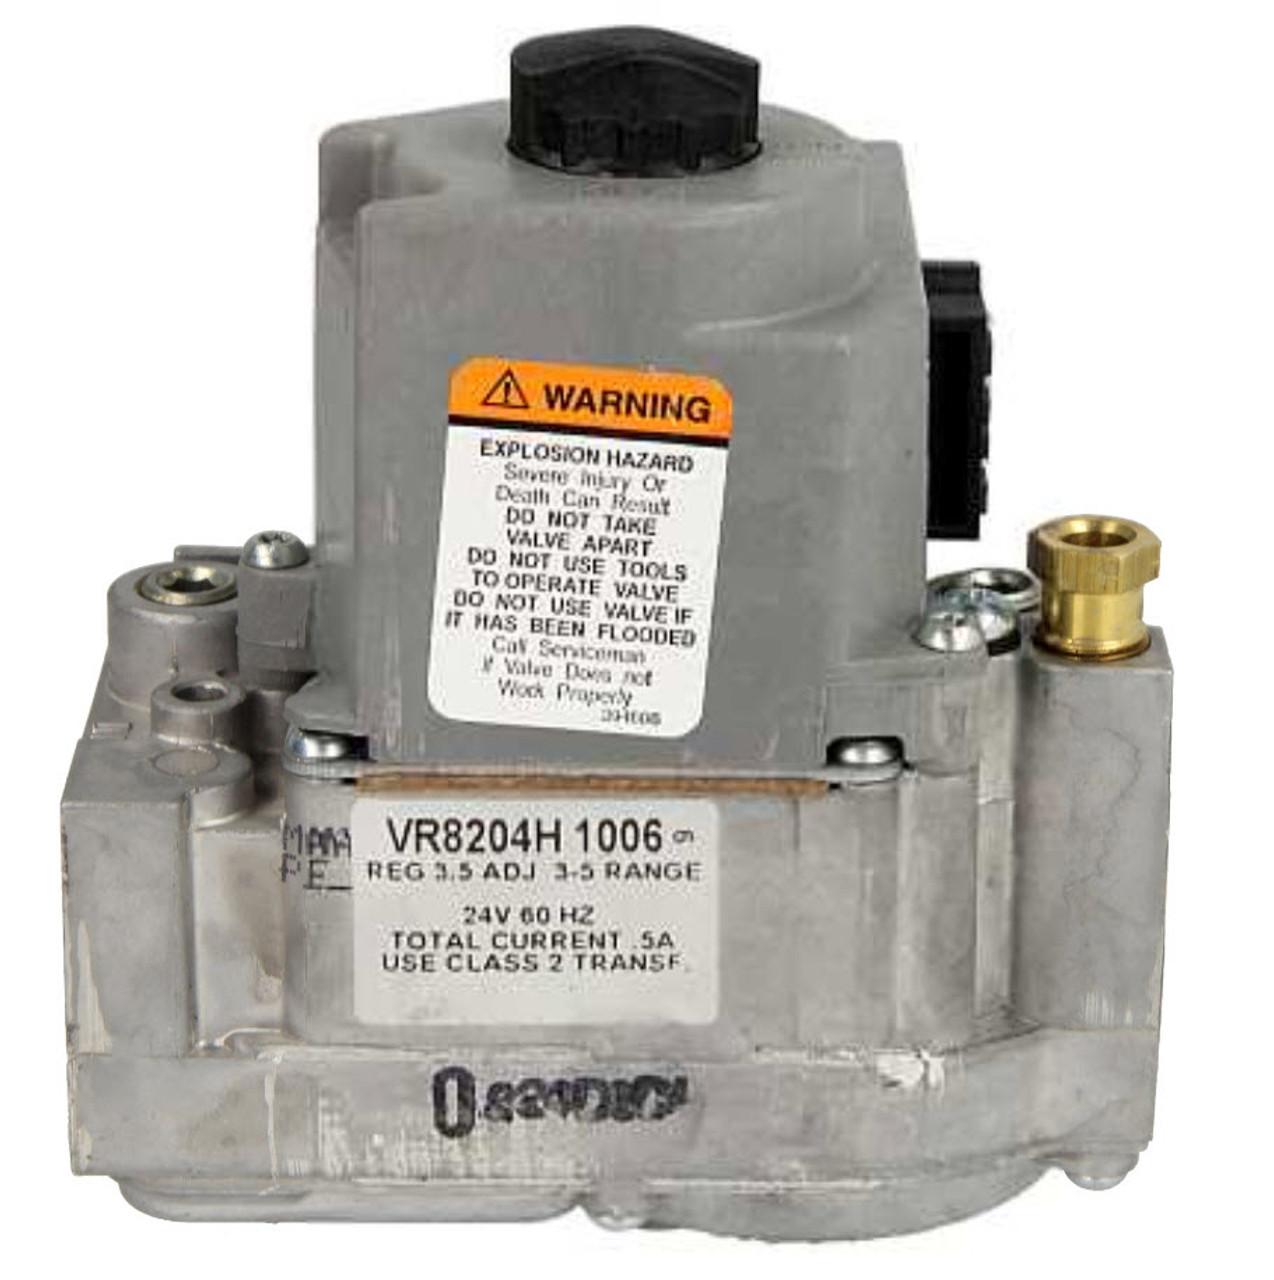 Honeywell VR8204H1006 Combination gas control